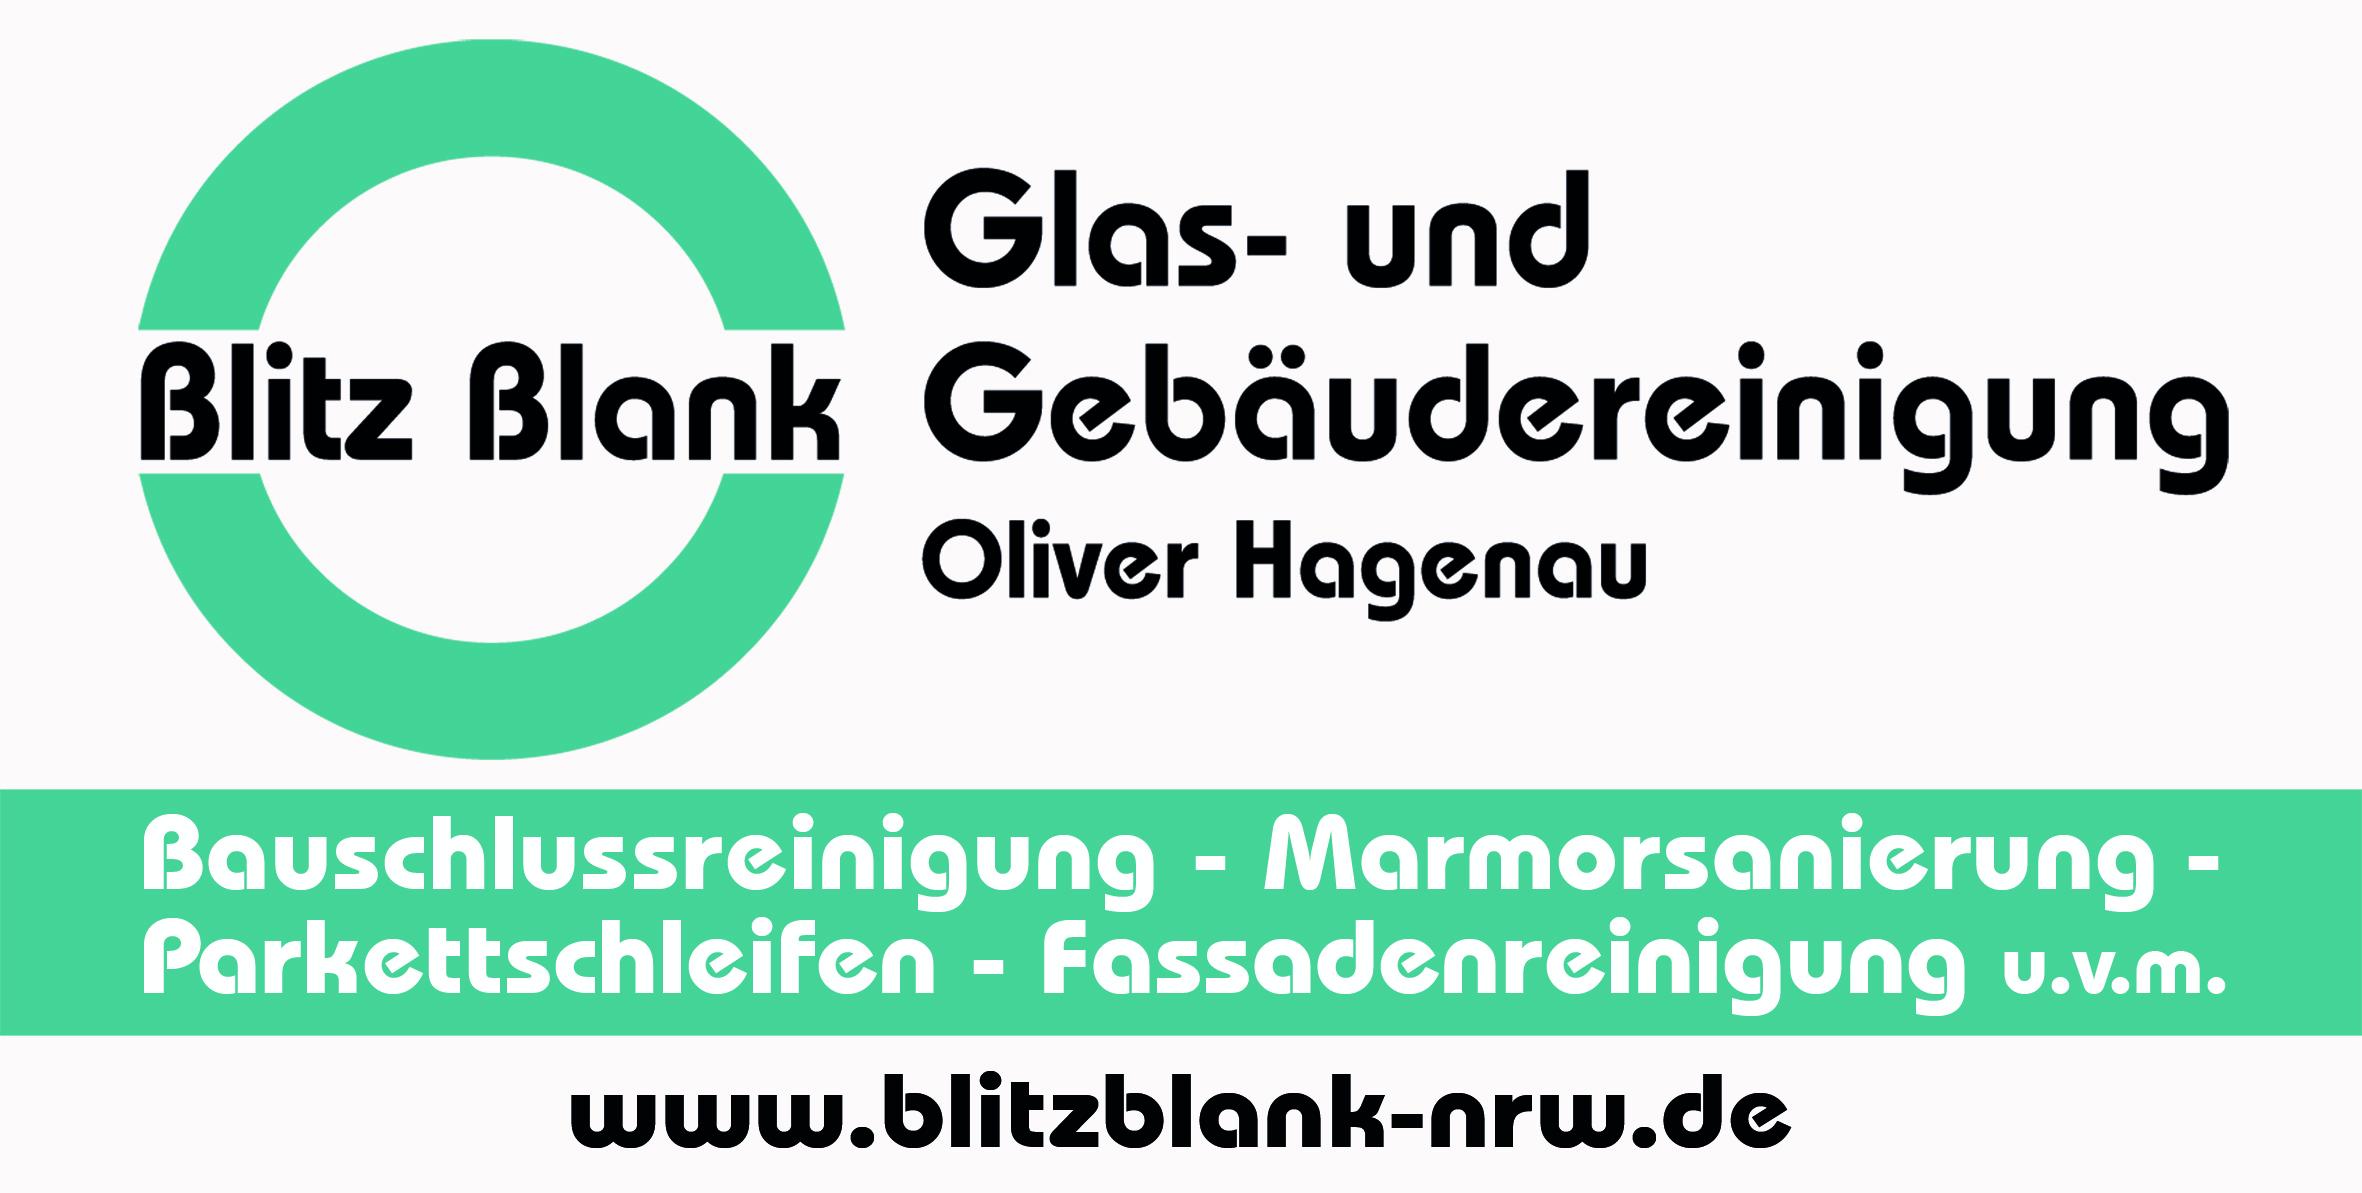 Plane-Blitz-Blank-2019